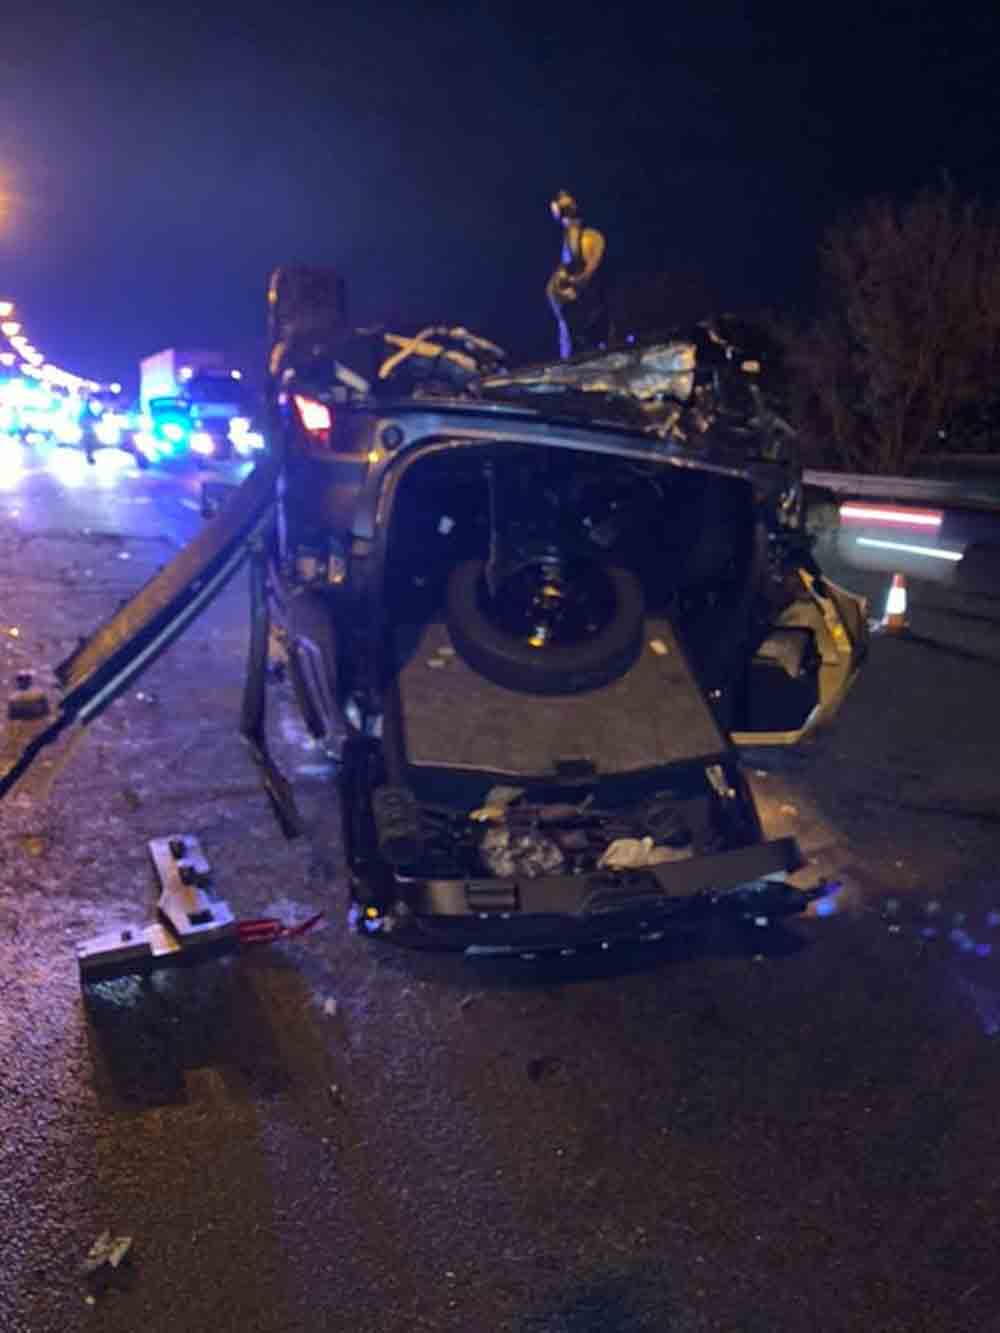 Essex Police share images of devastating crash that remarkably nobody was injured in - Travel News UK